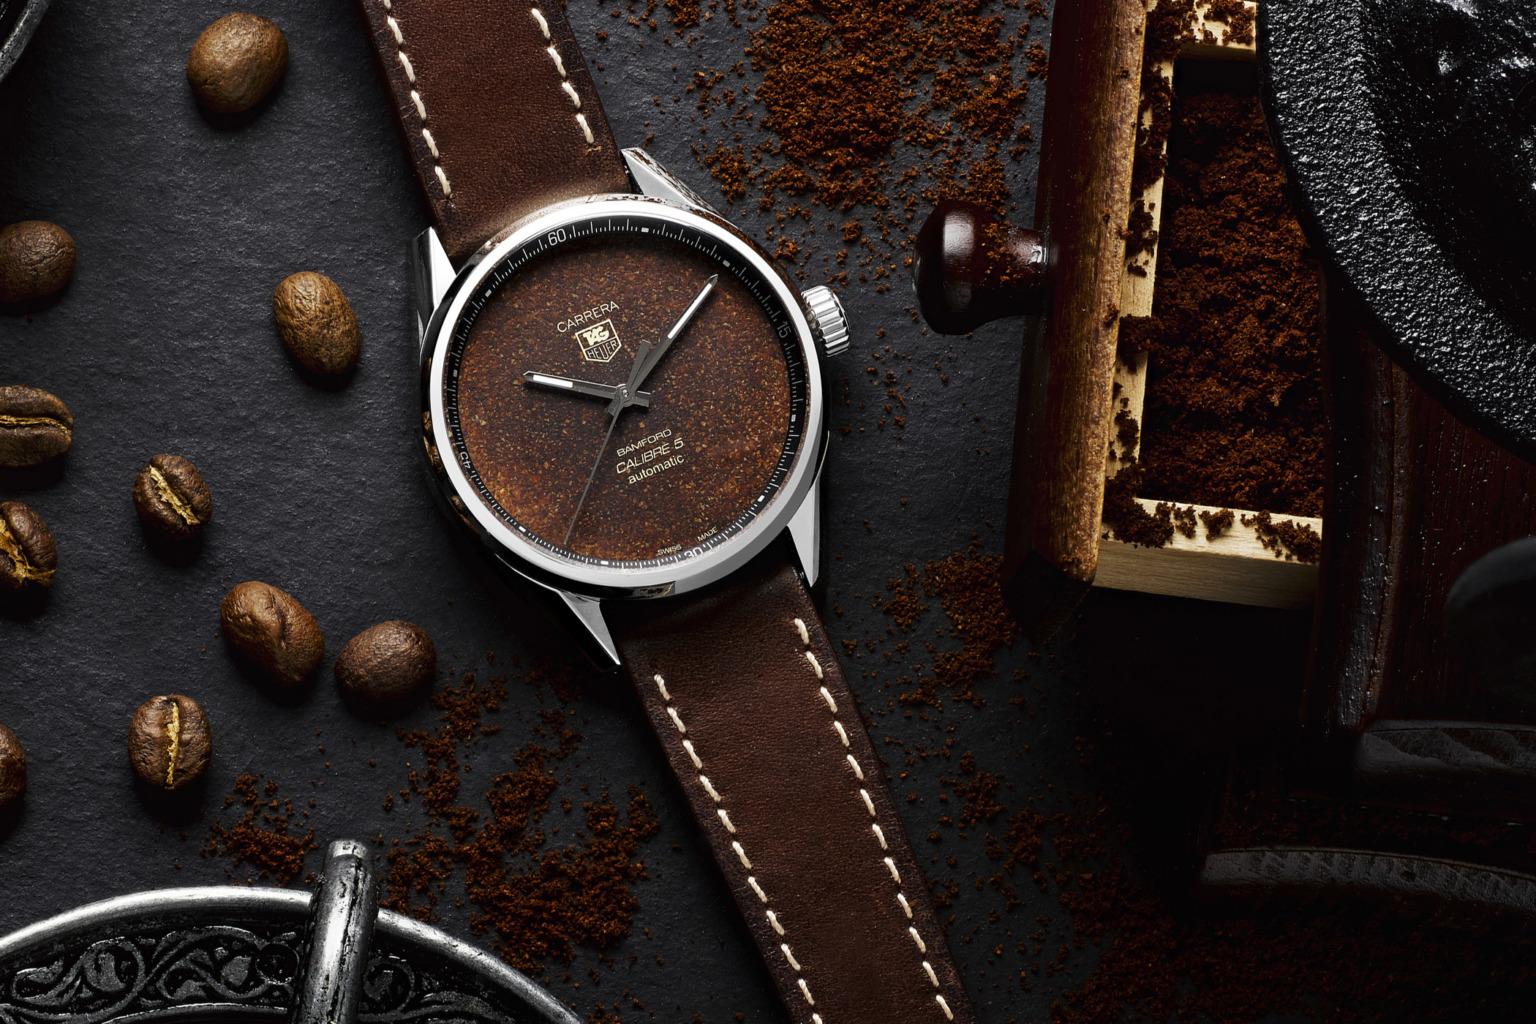 https://k8q7r7a2.stackpathcdn.com/wp-content/uploads/2020/05/Bamford-x-Badgerworks-TAG-Heuer-Carrera-Calibre-5-Tropical-Coffee-Dial-1-1536x1024.jpg